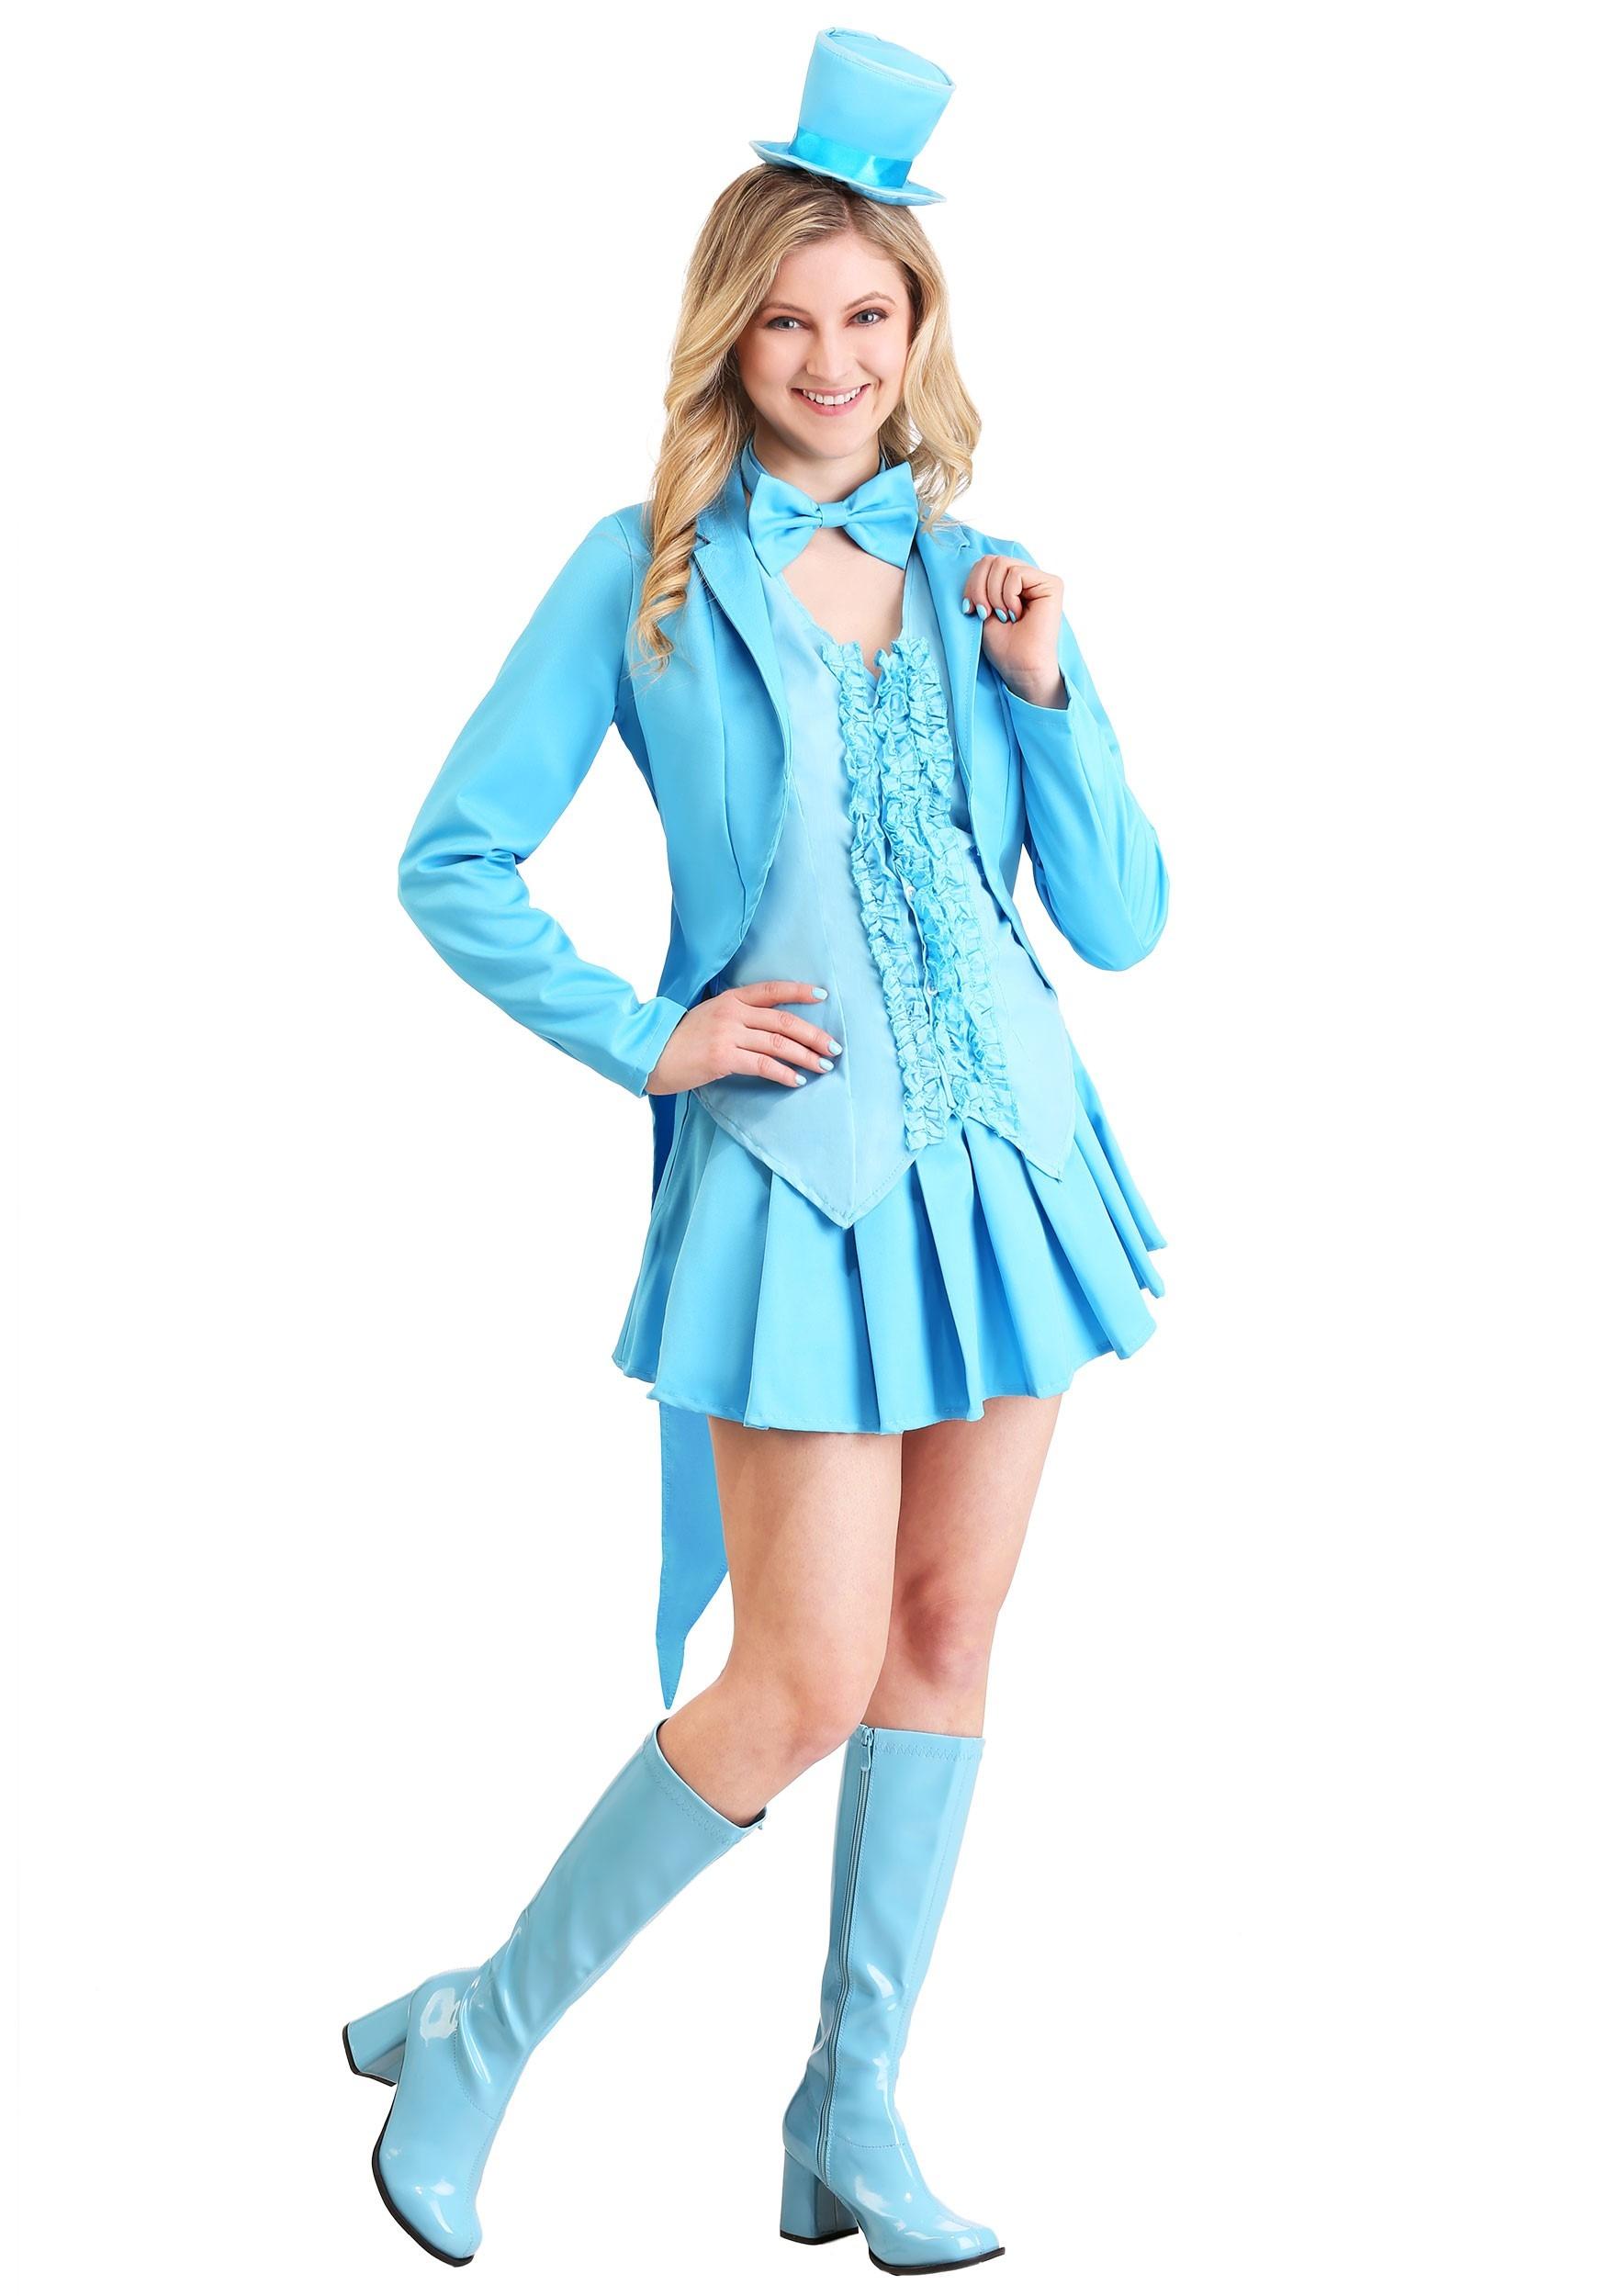 Sexy Blue Tuxedo Costume for Women